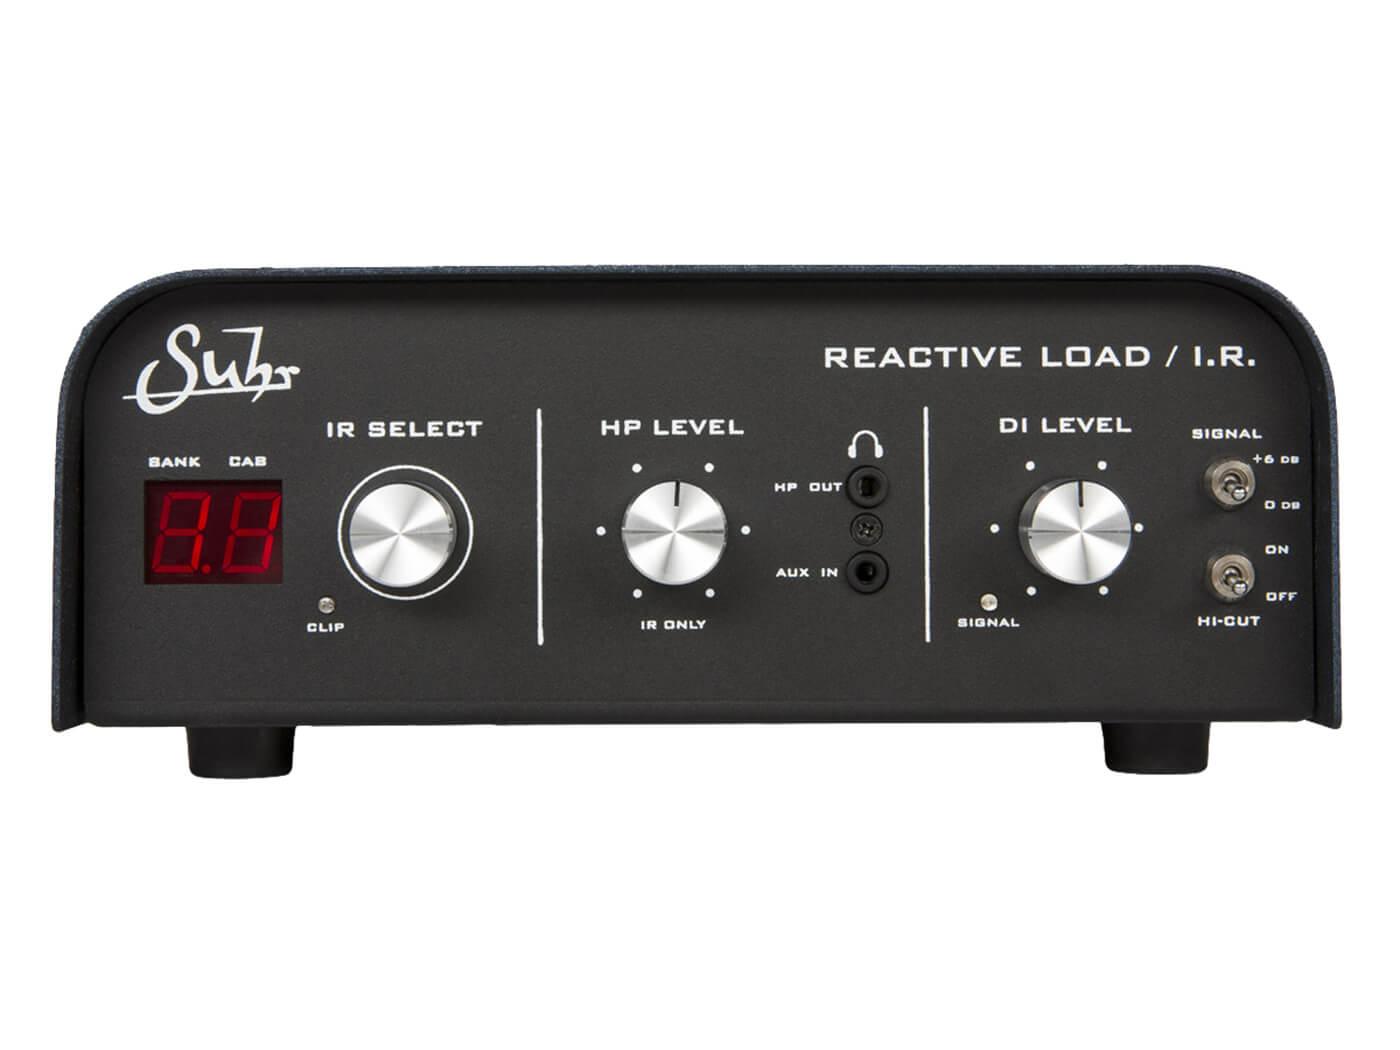 Suhr Announces The Reactive Load Ir